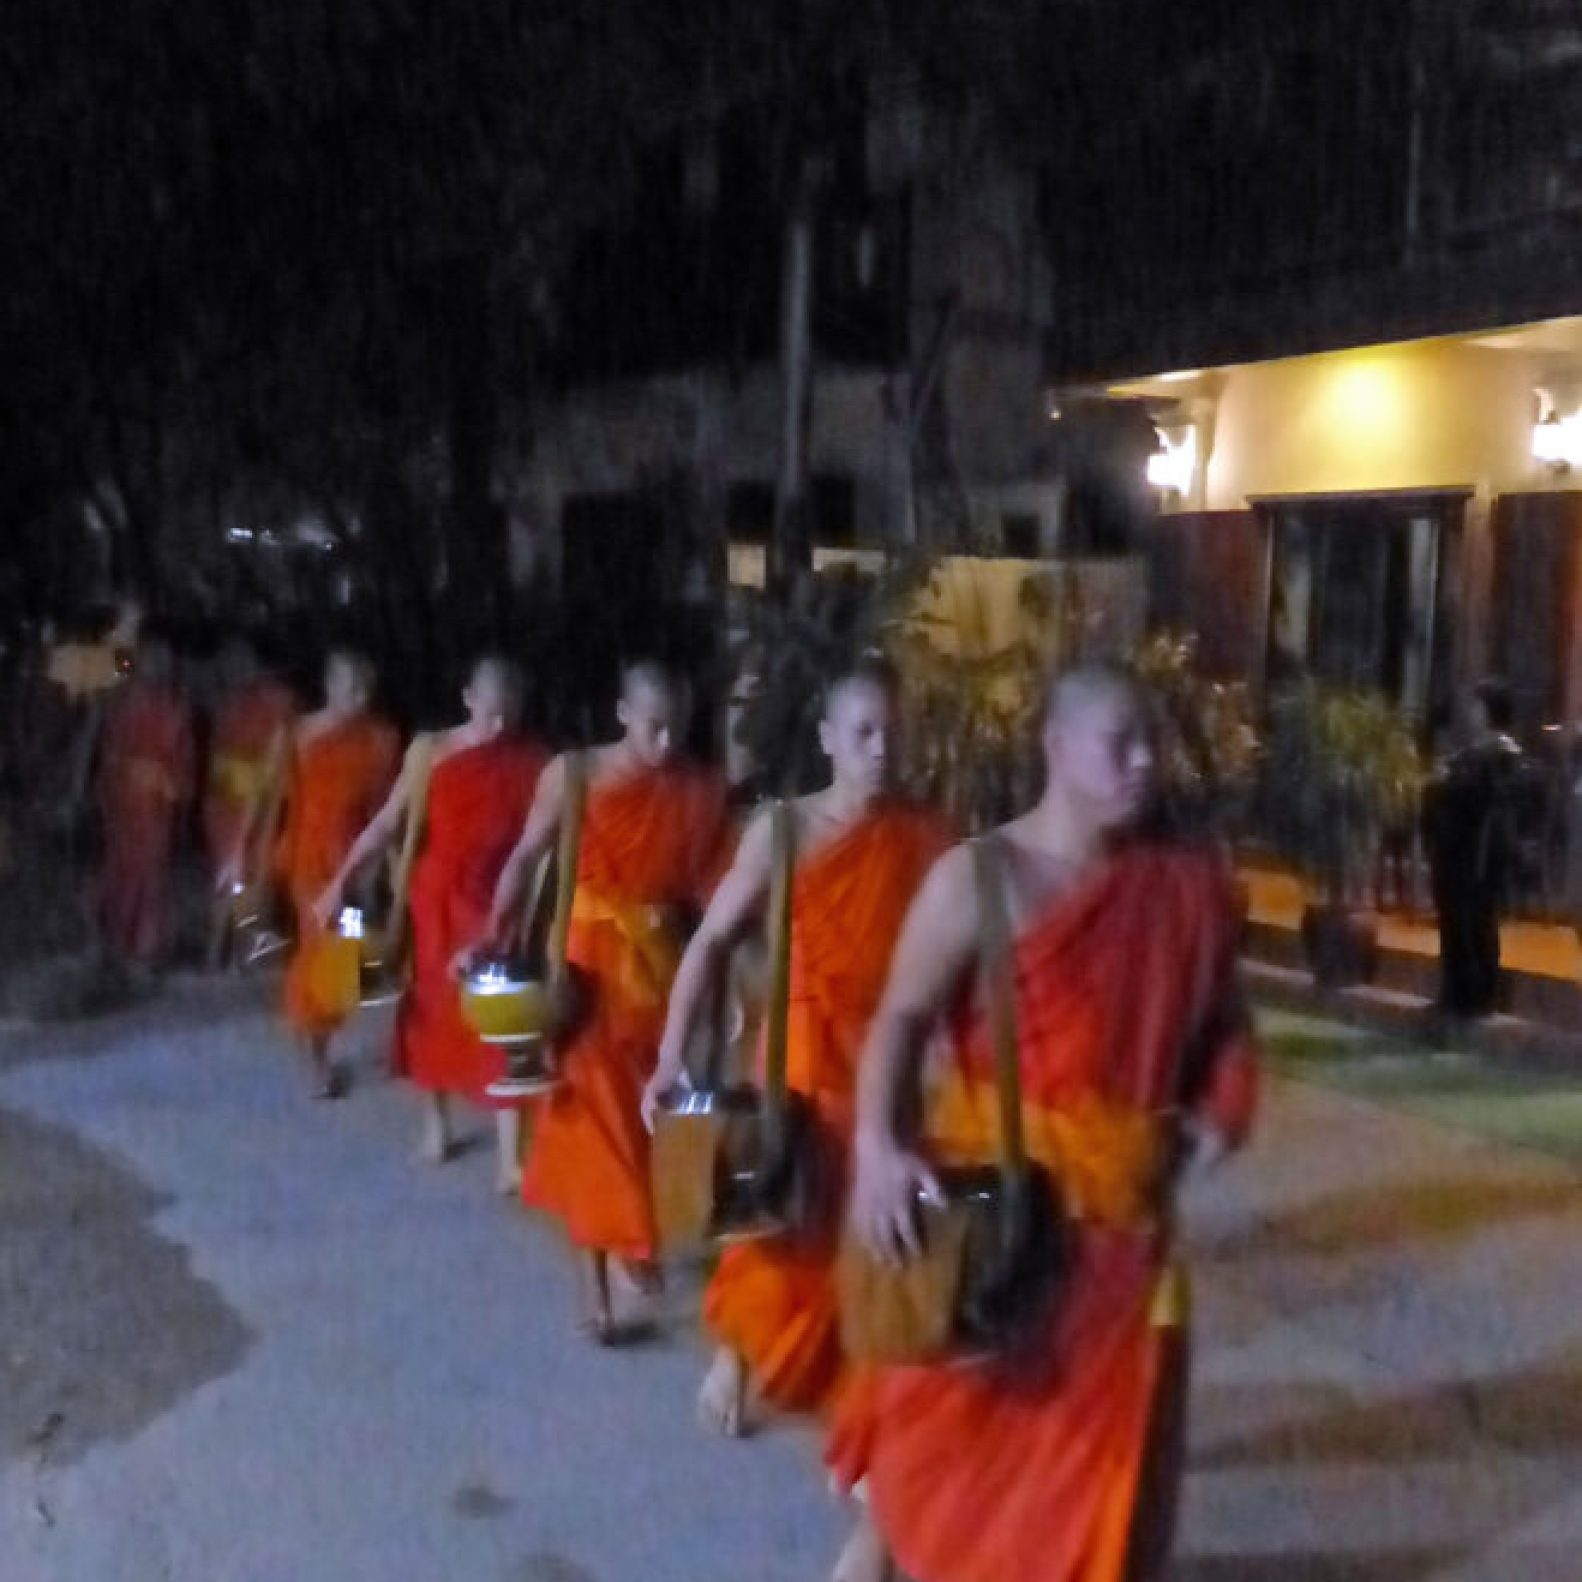 Young men in orange robes walking in single file